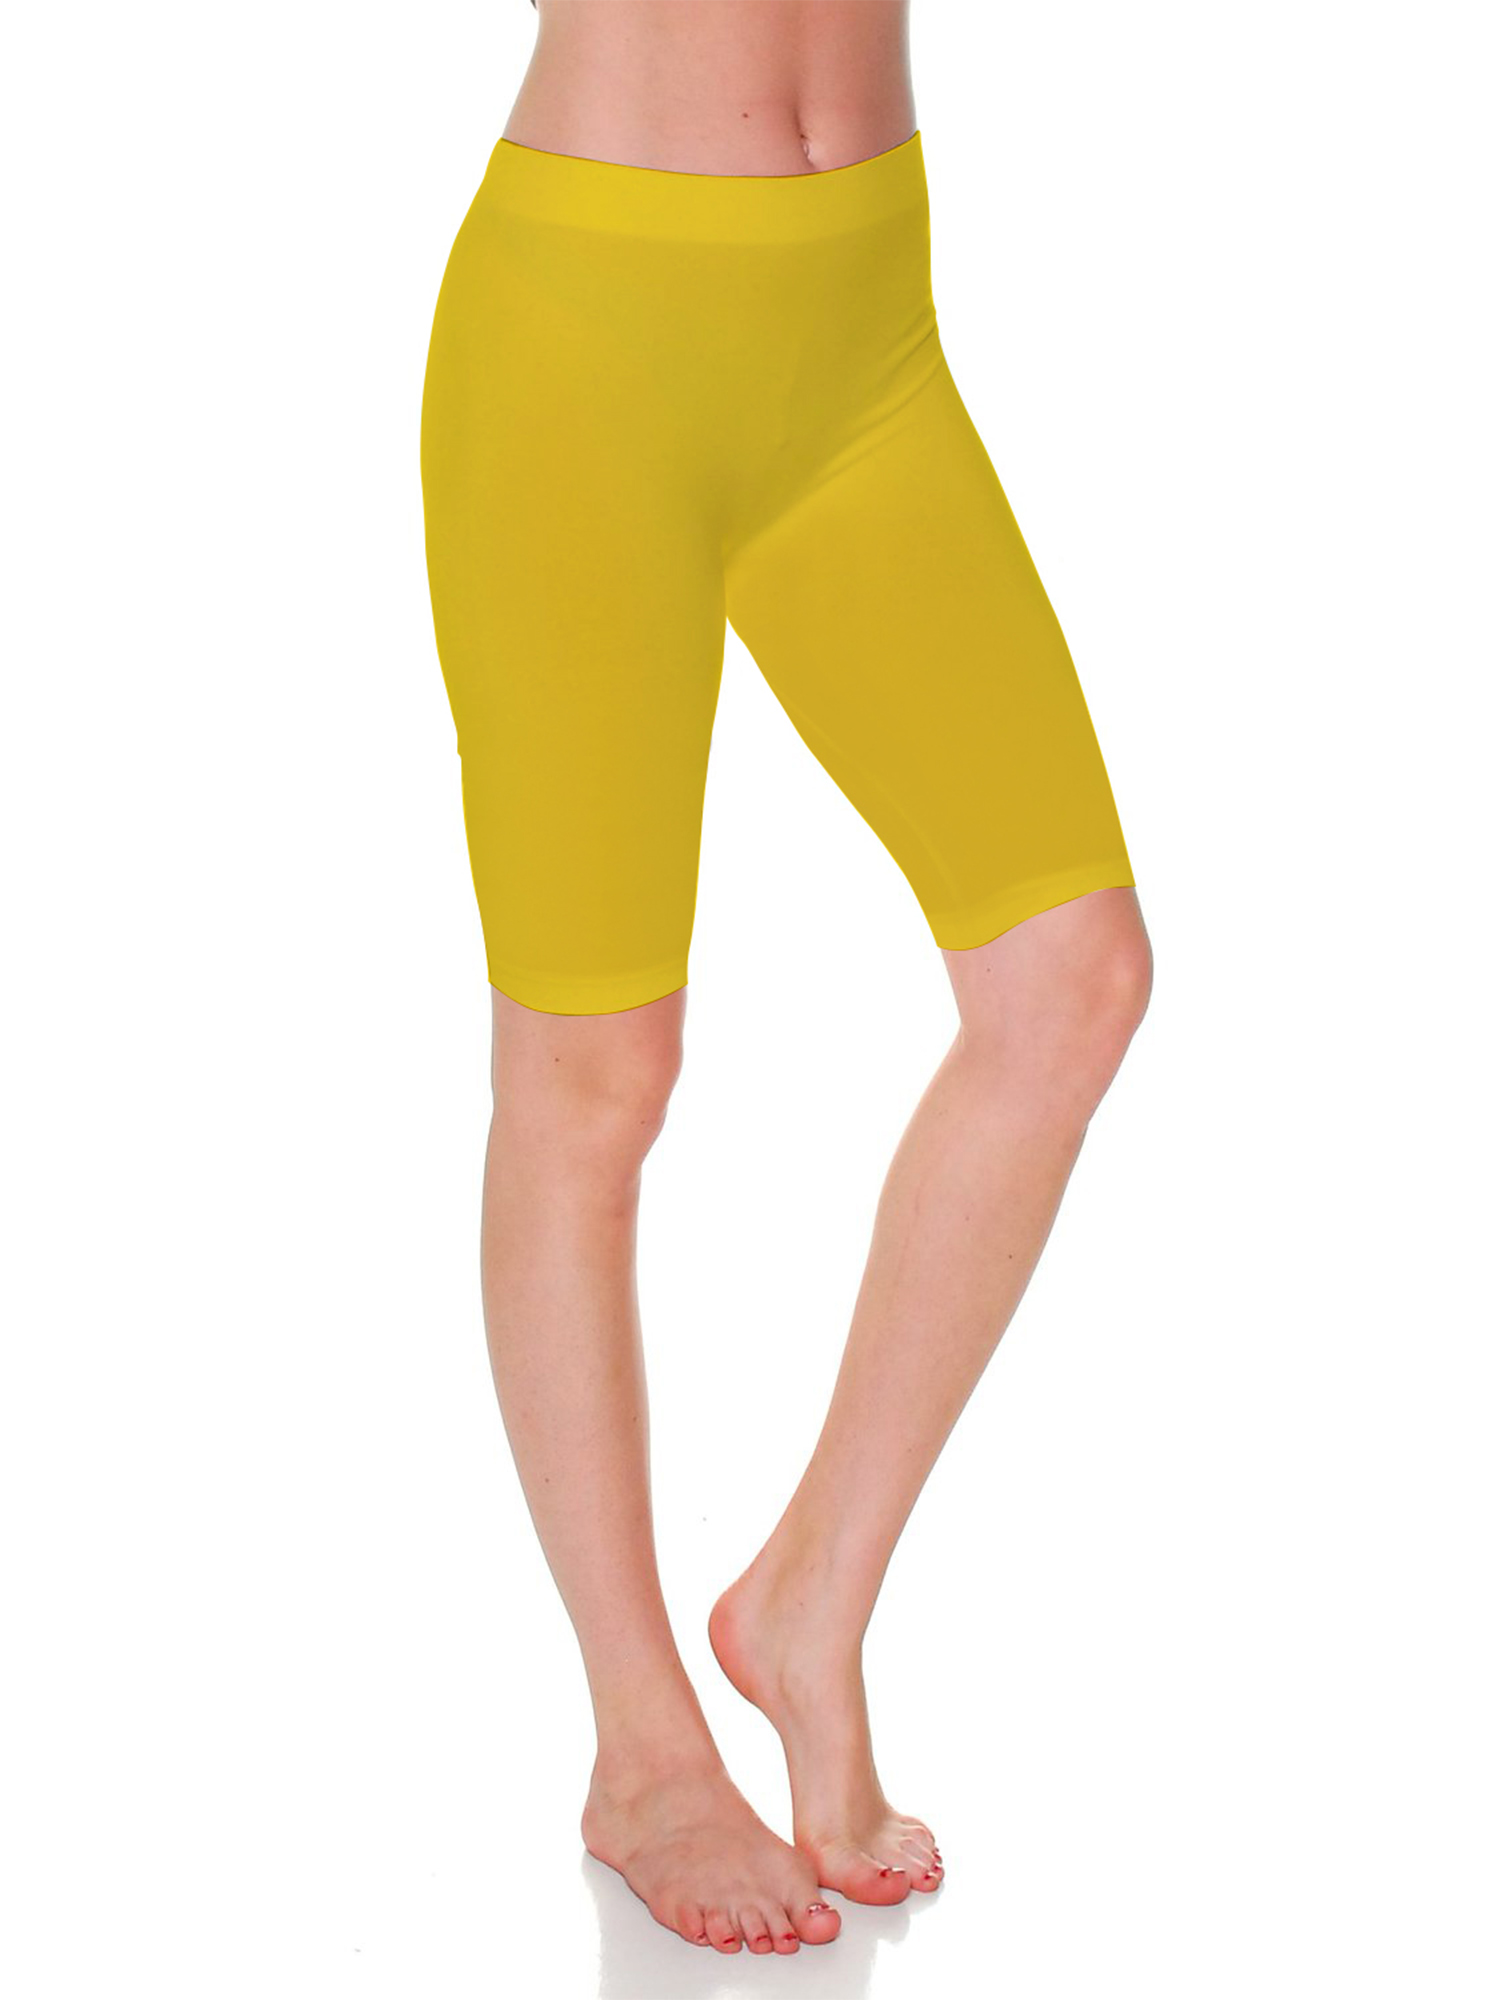 Emmalise Women's Capri 17 in Knee Length Bermuda Seamless Legging - Junior, Plus Size